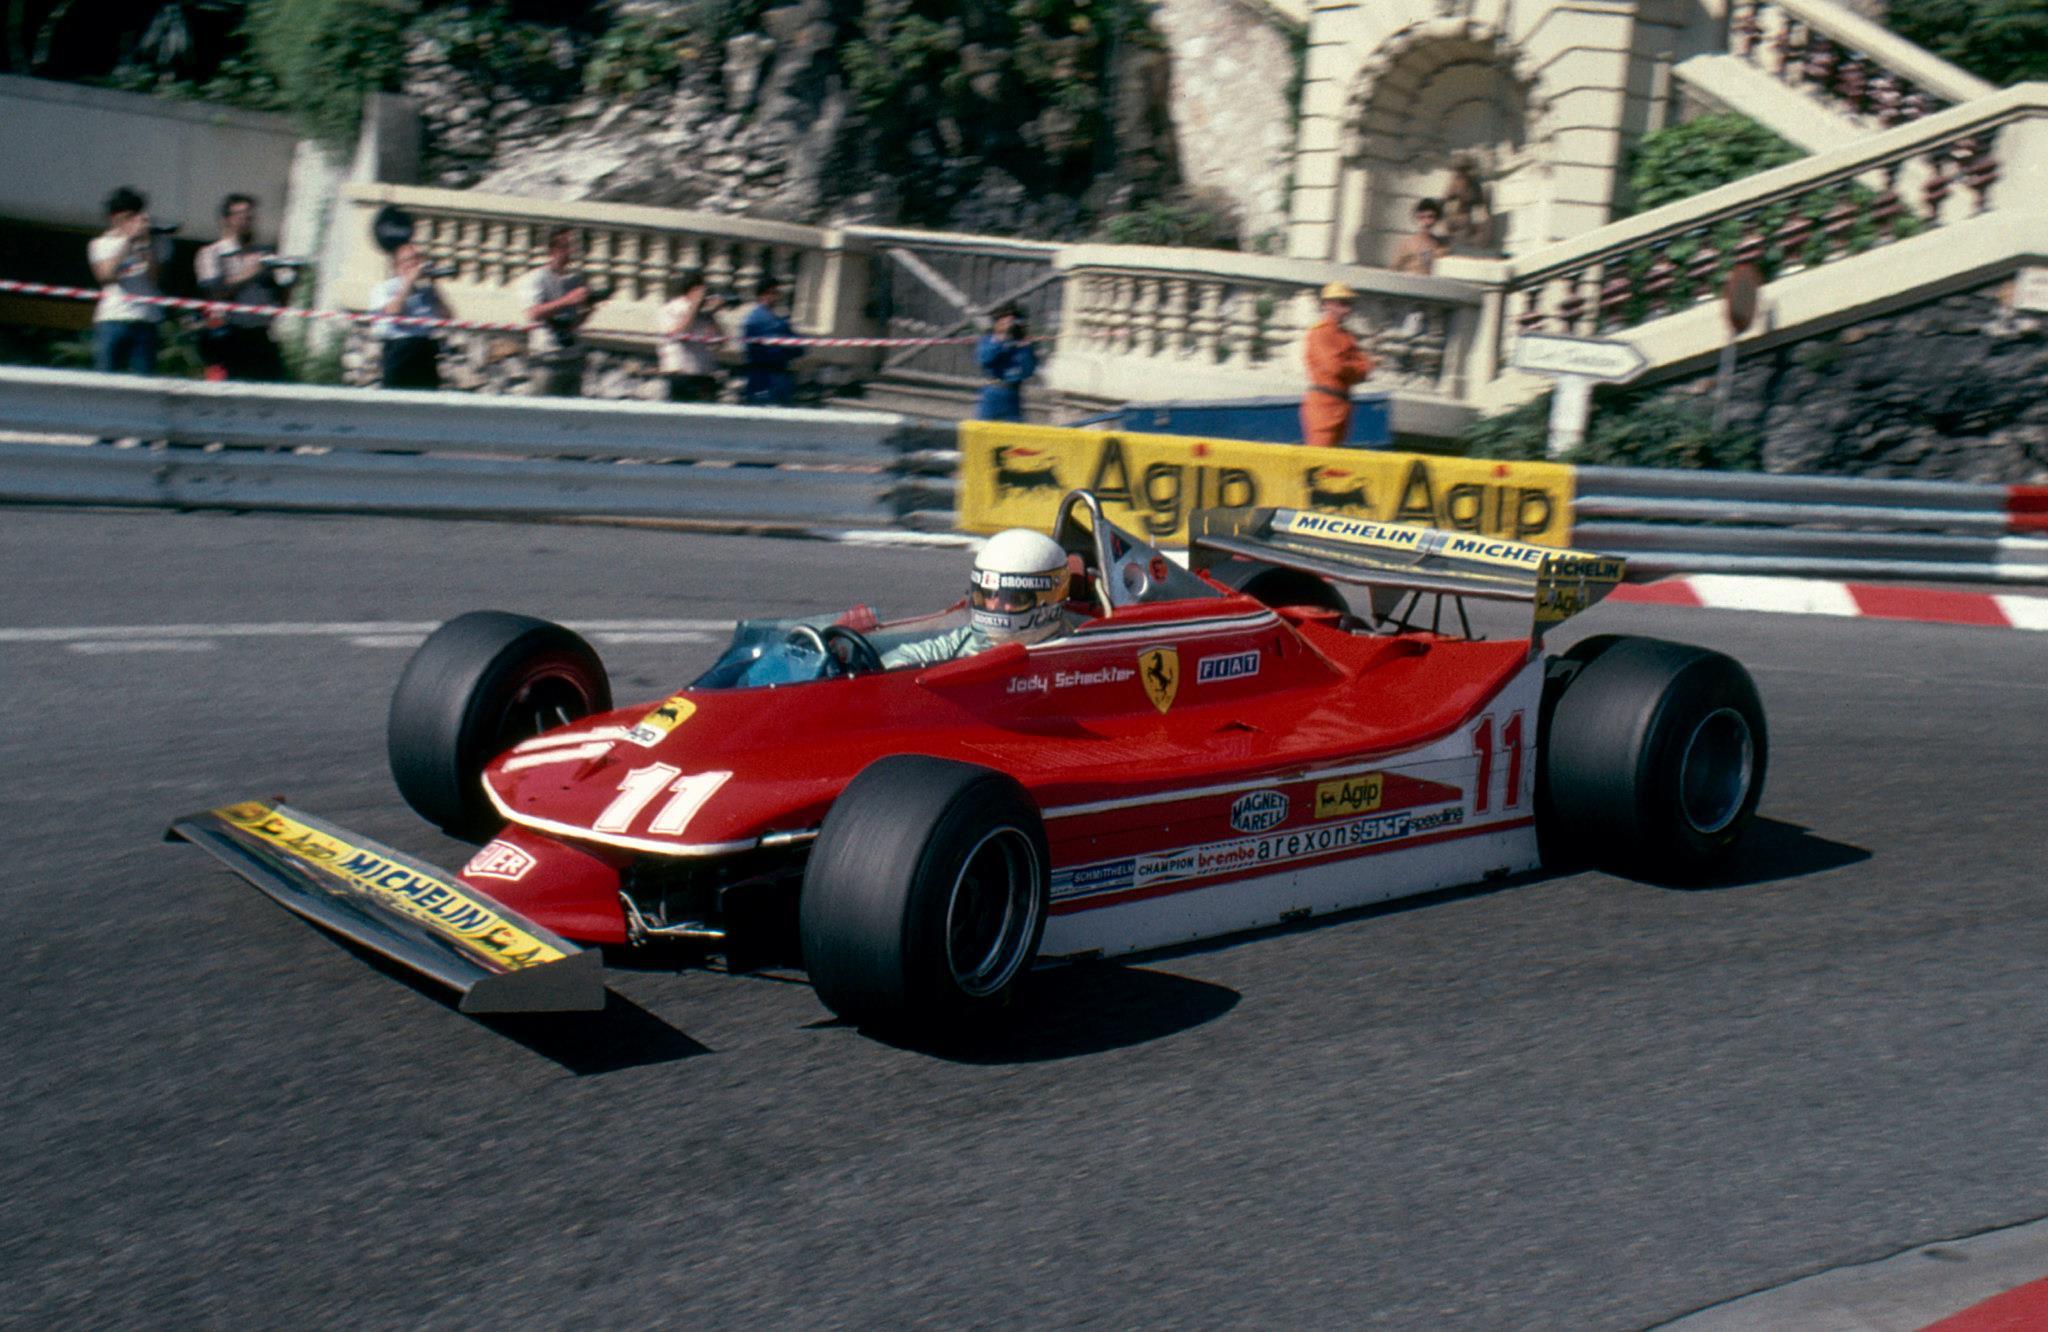 Jody_Scheckter_1979_Monaco.jpg